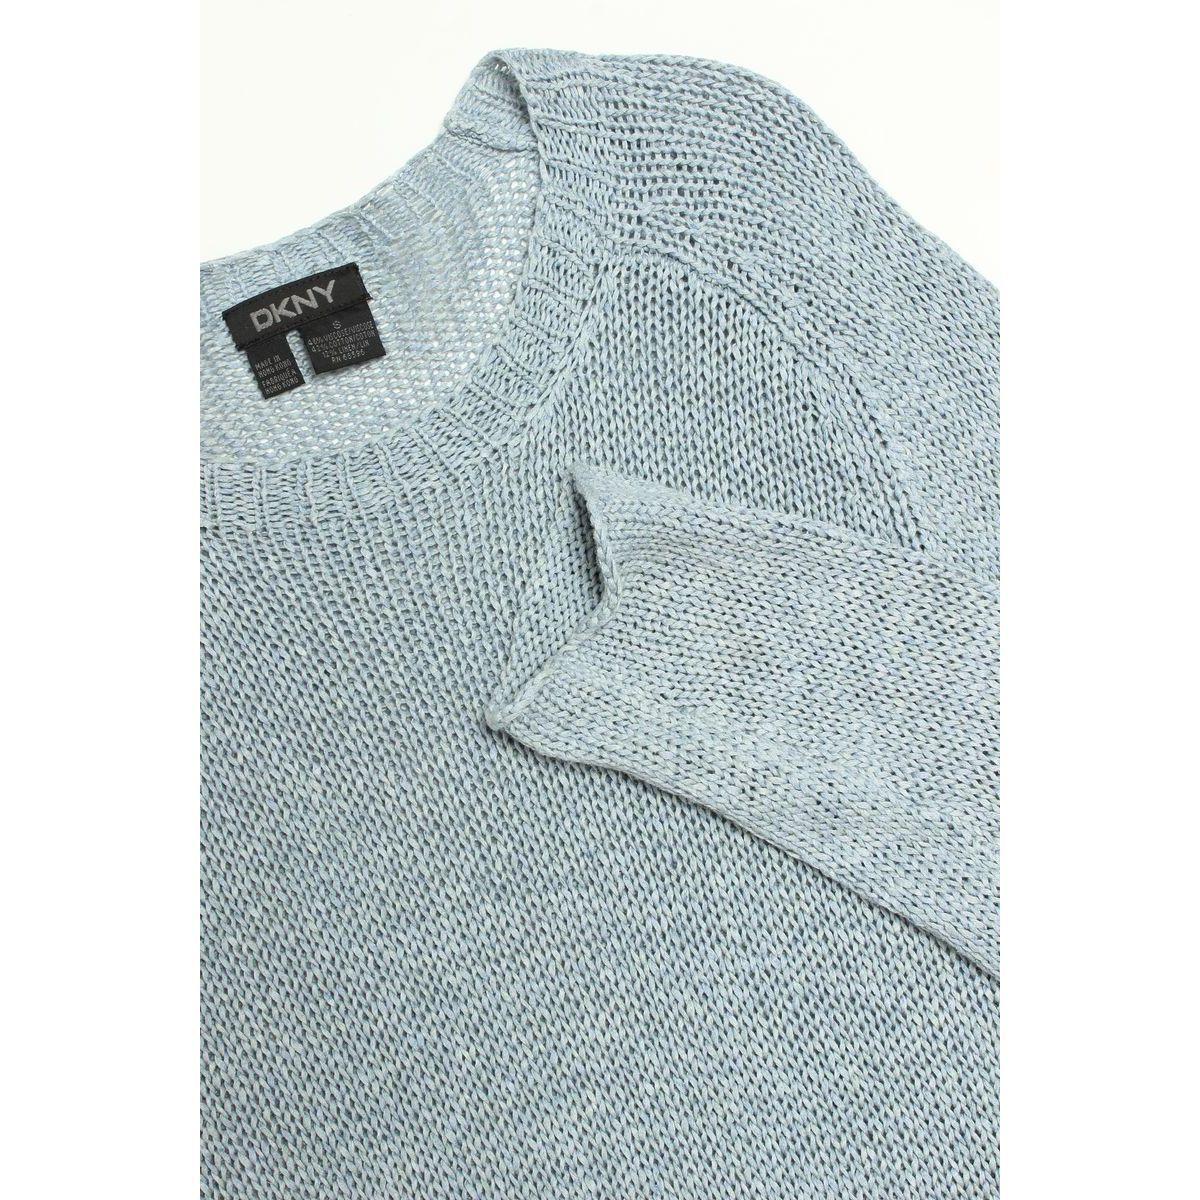 DKNY ダナキャラン ニューヨーク セーター ニット 長袖  青 ブルー S 910135_画像3